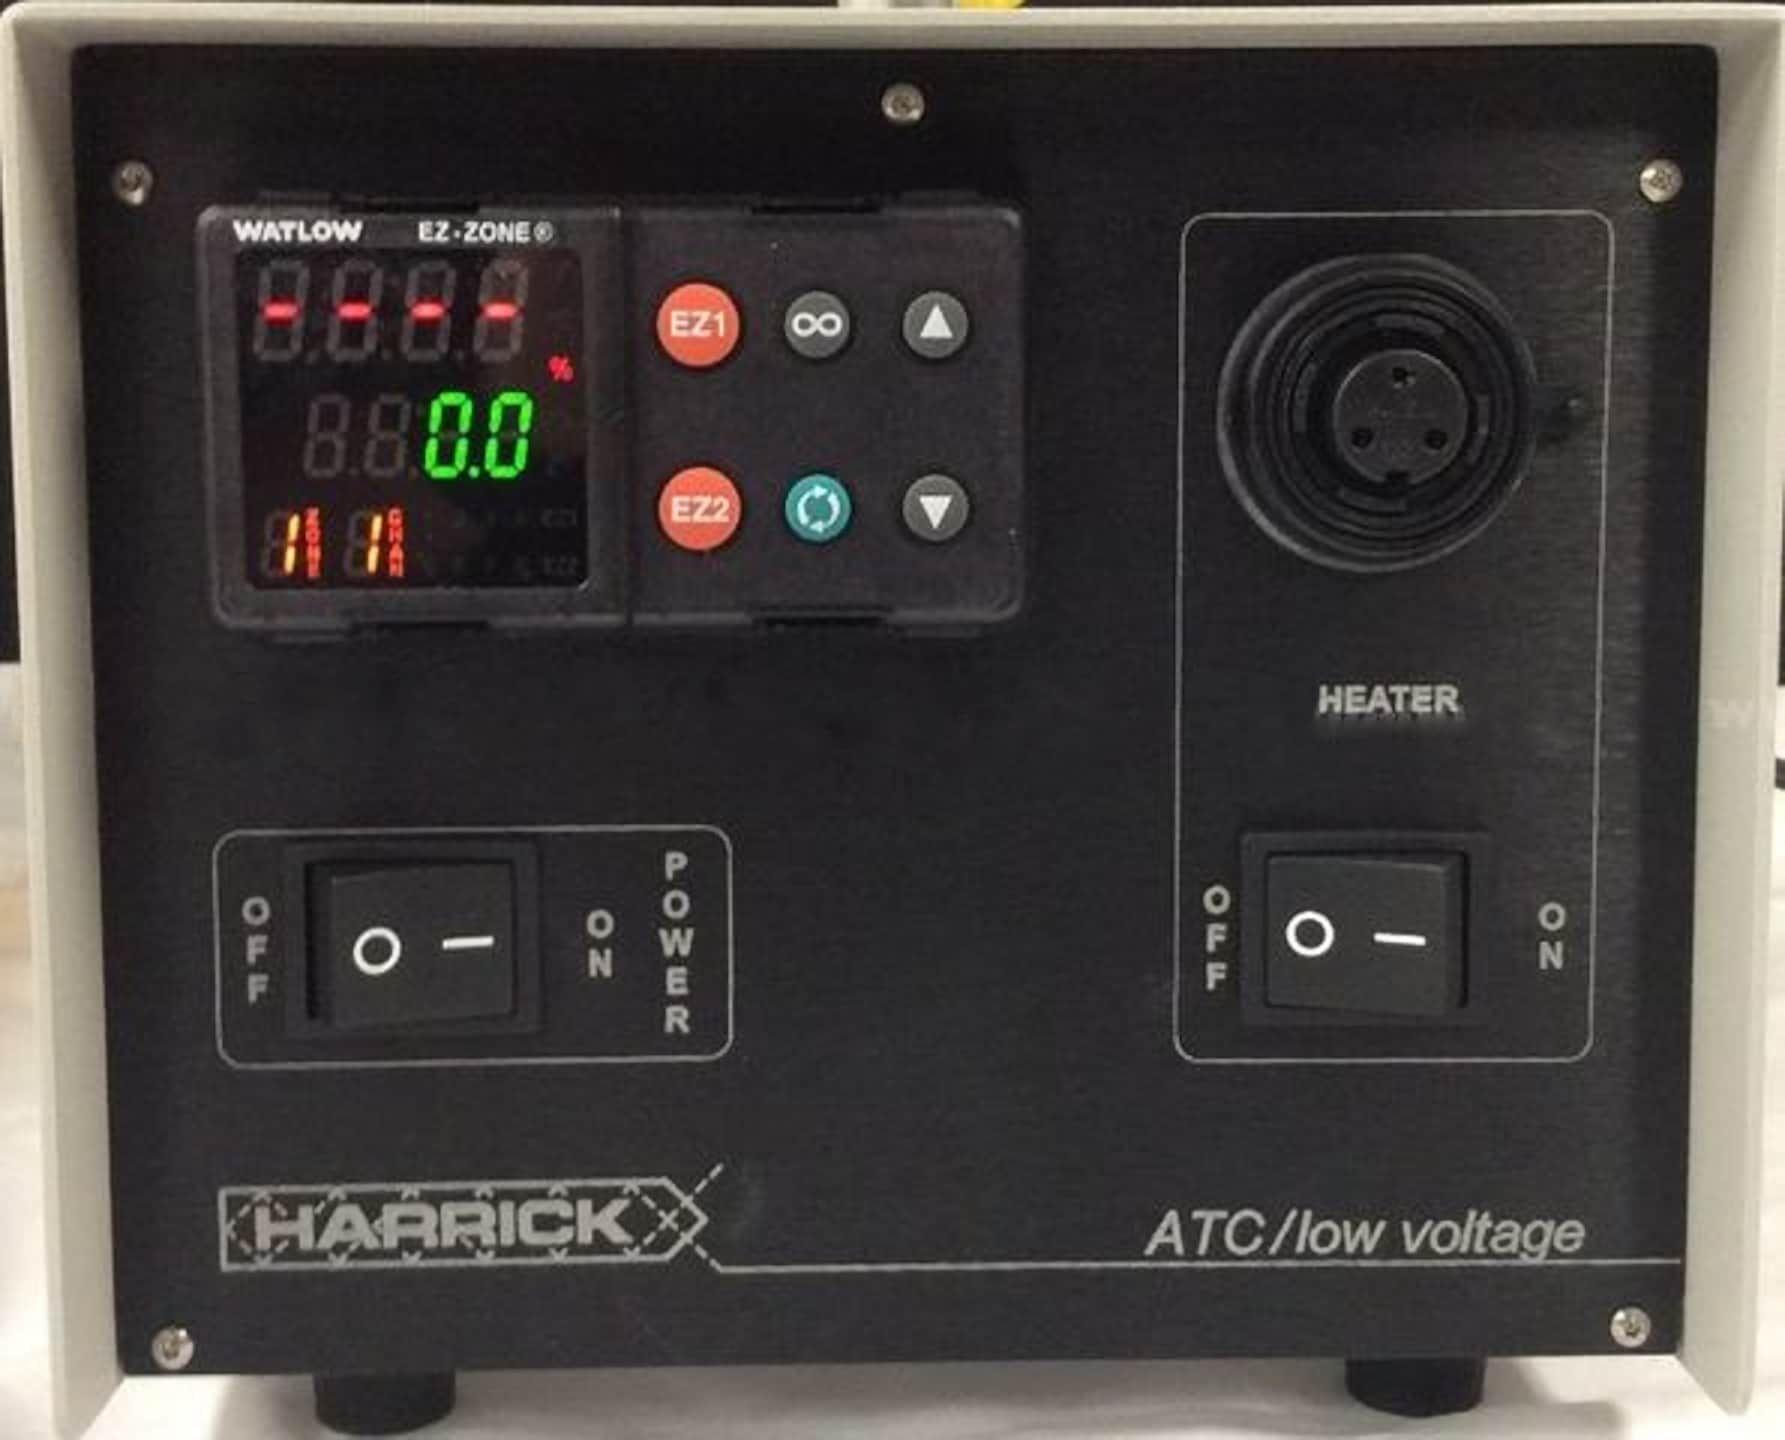 PerkinElmer Spectrum Two 3 Pcs., ATC/FT-IR Components